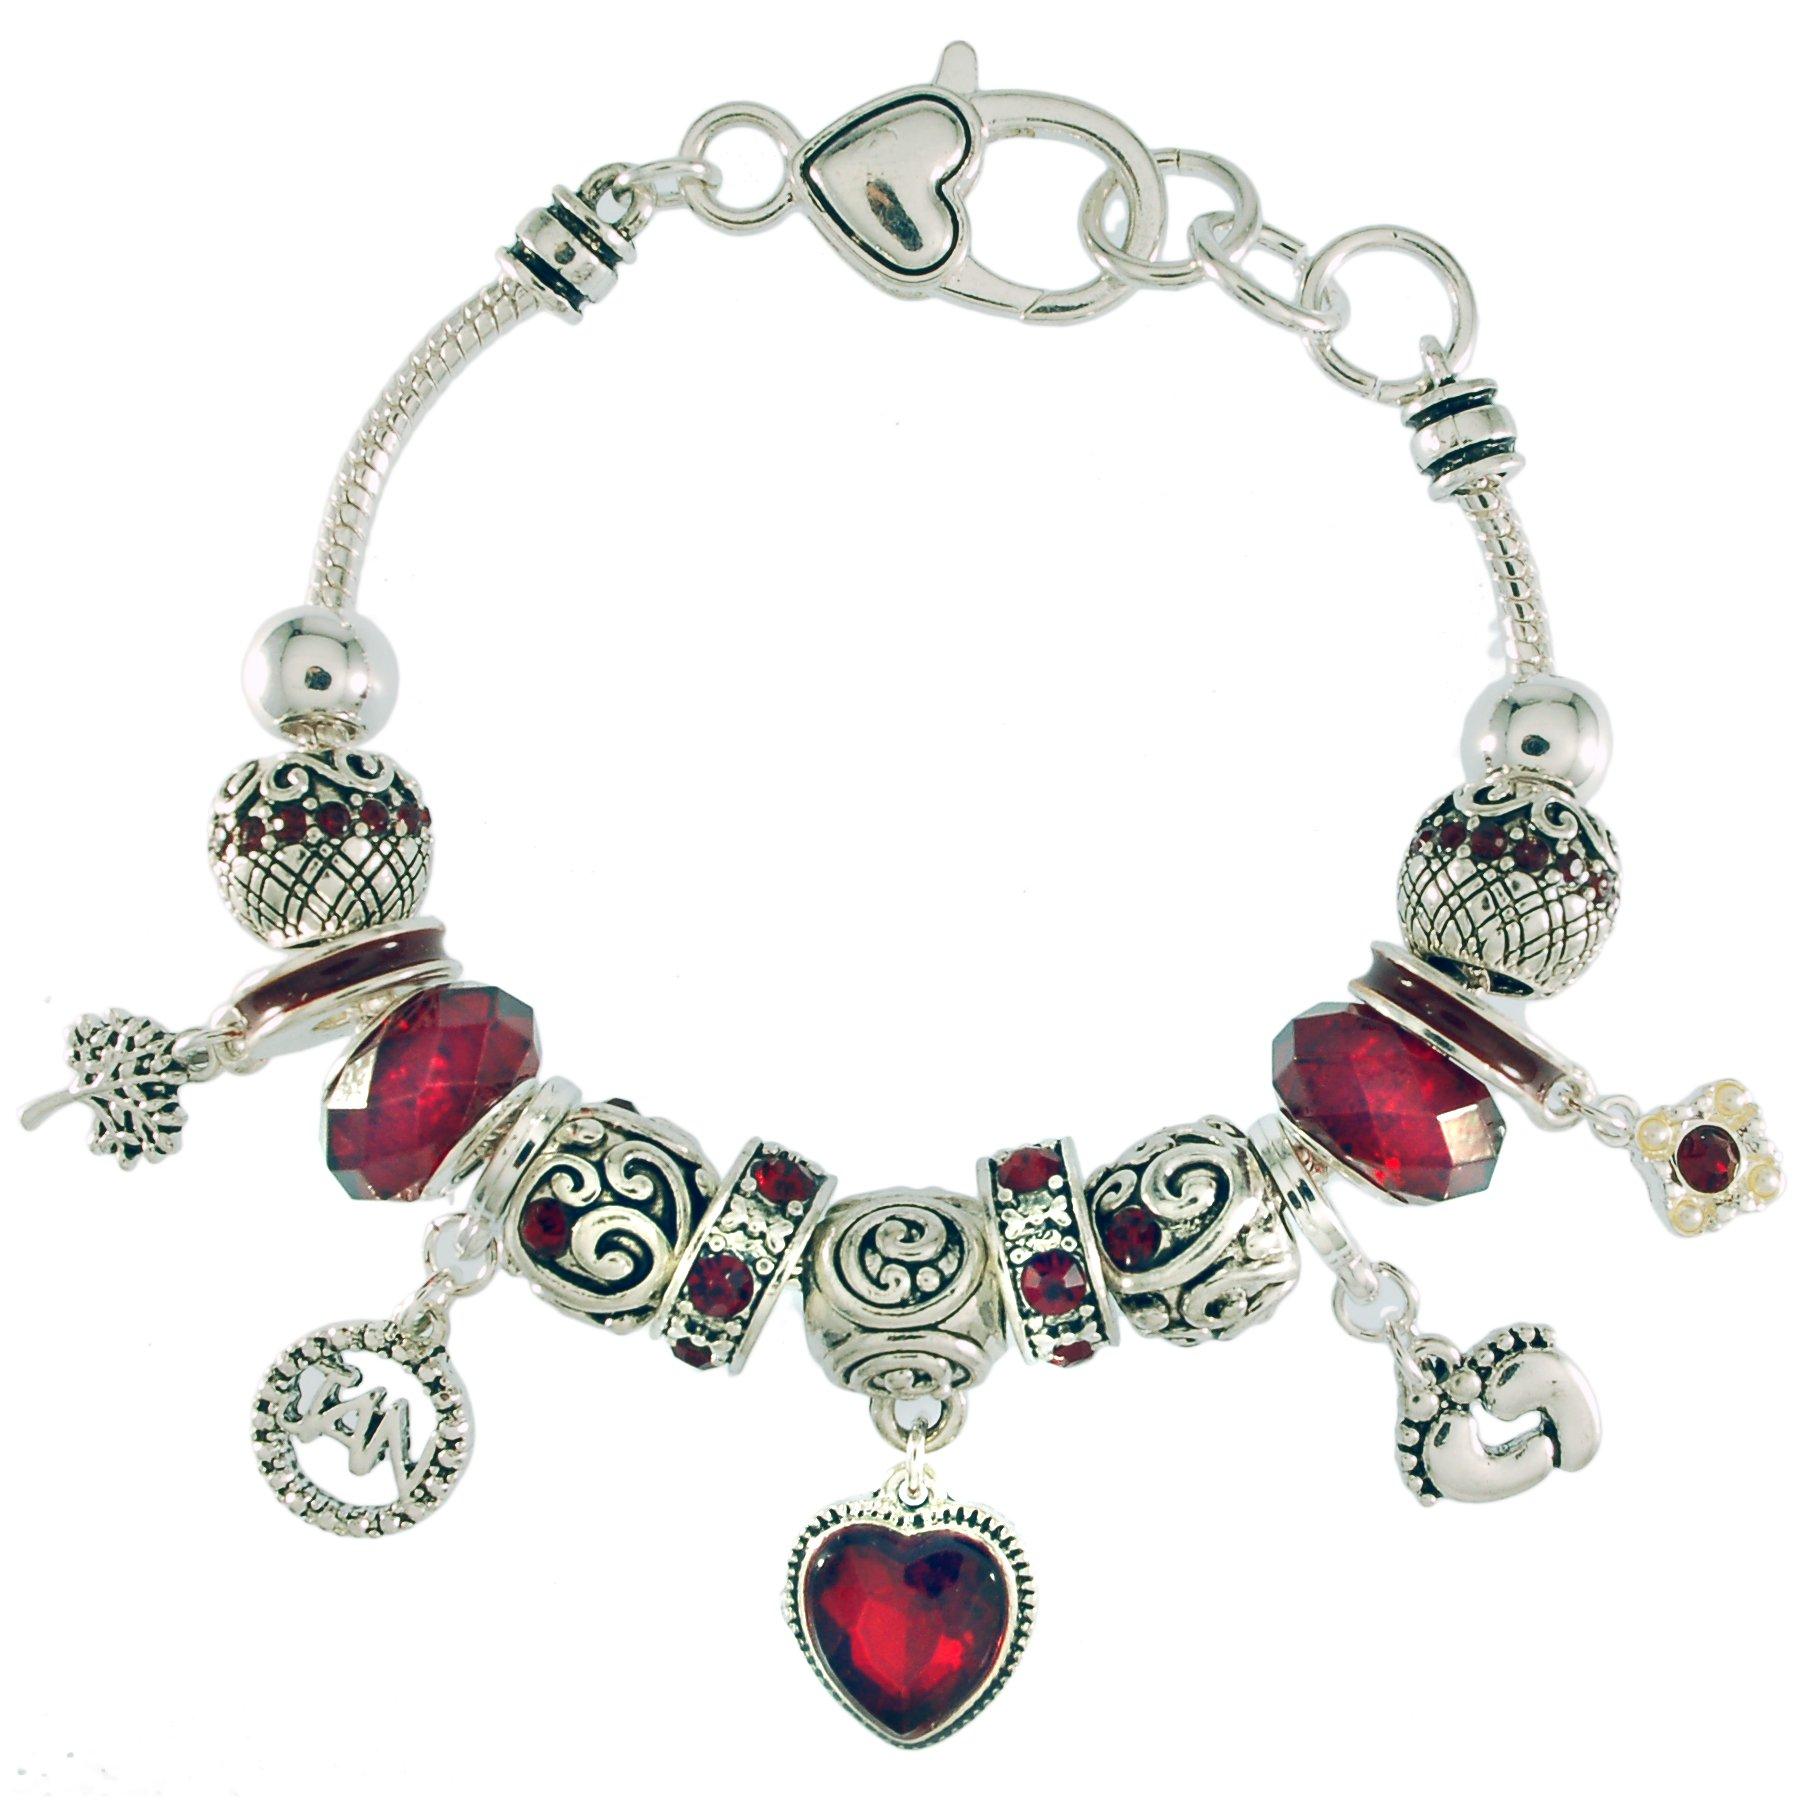 Landau Ambrosia January Birthstone Charm Bracelet